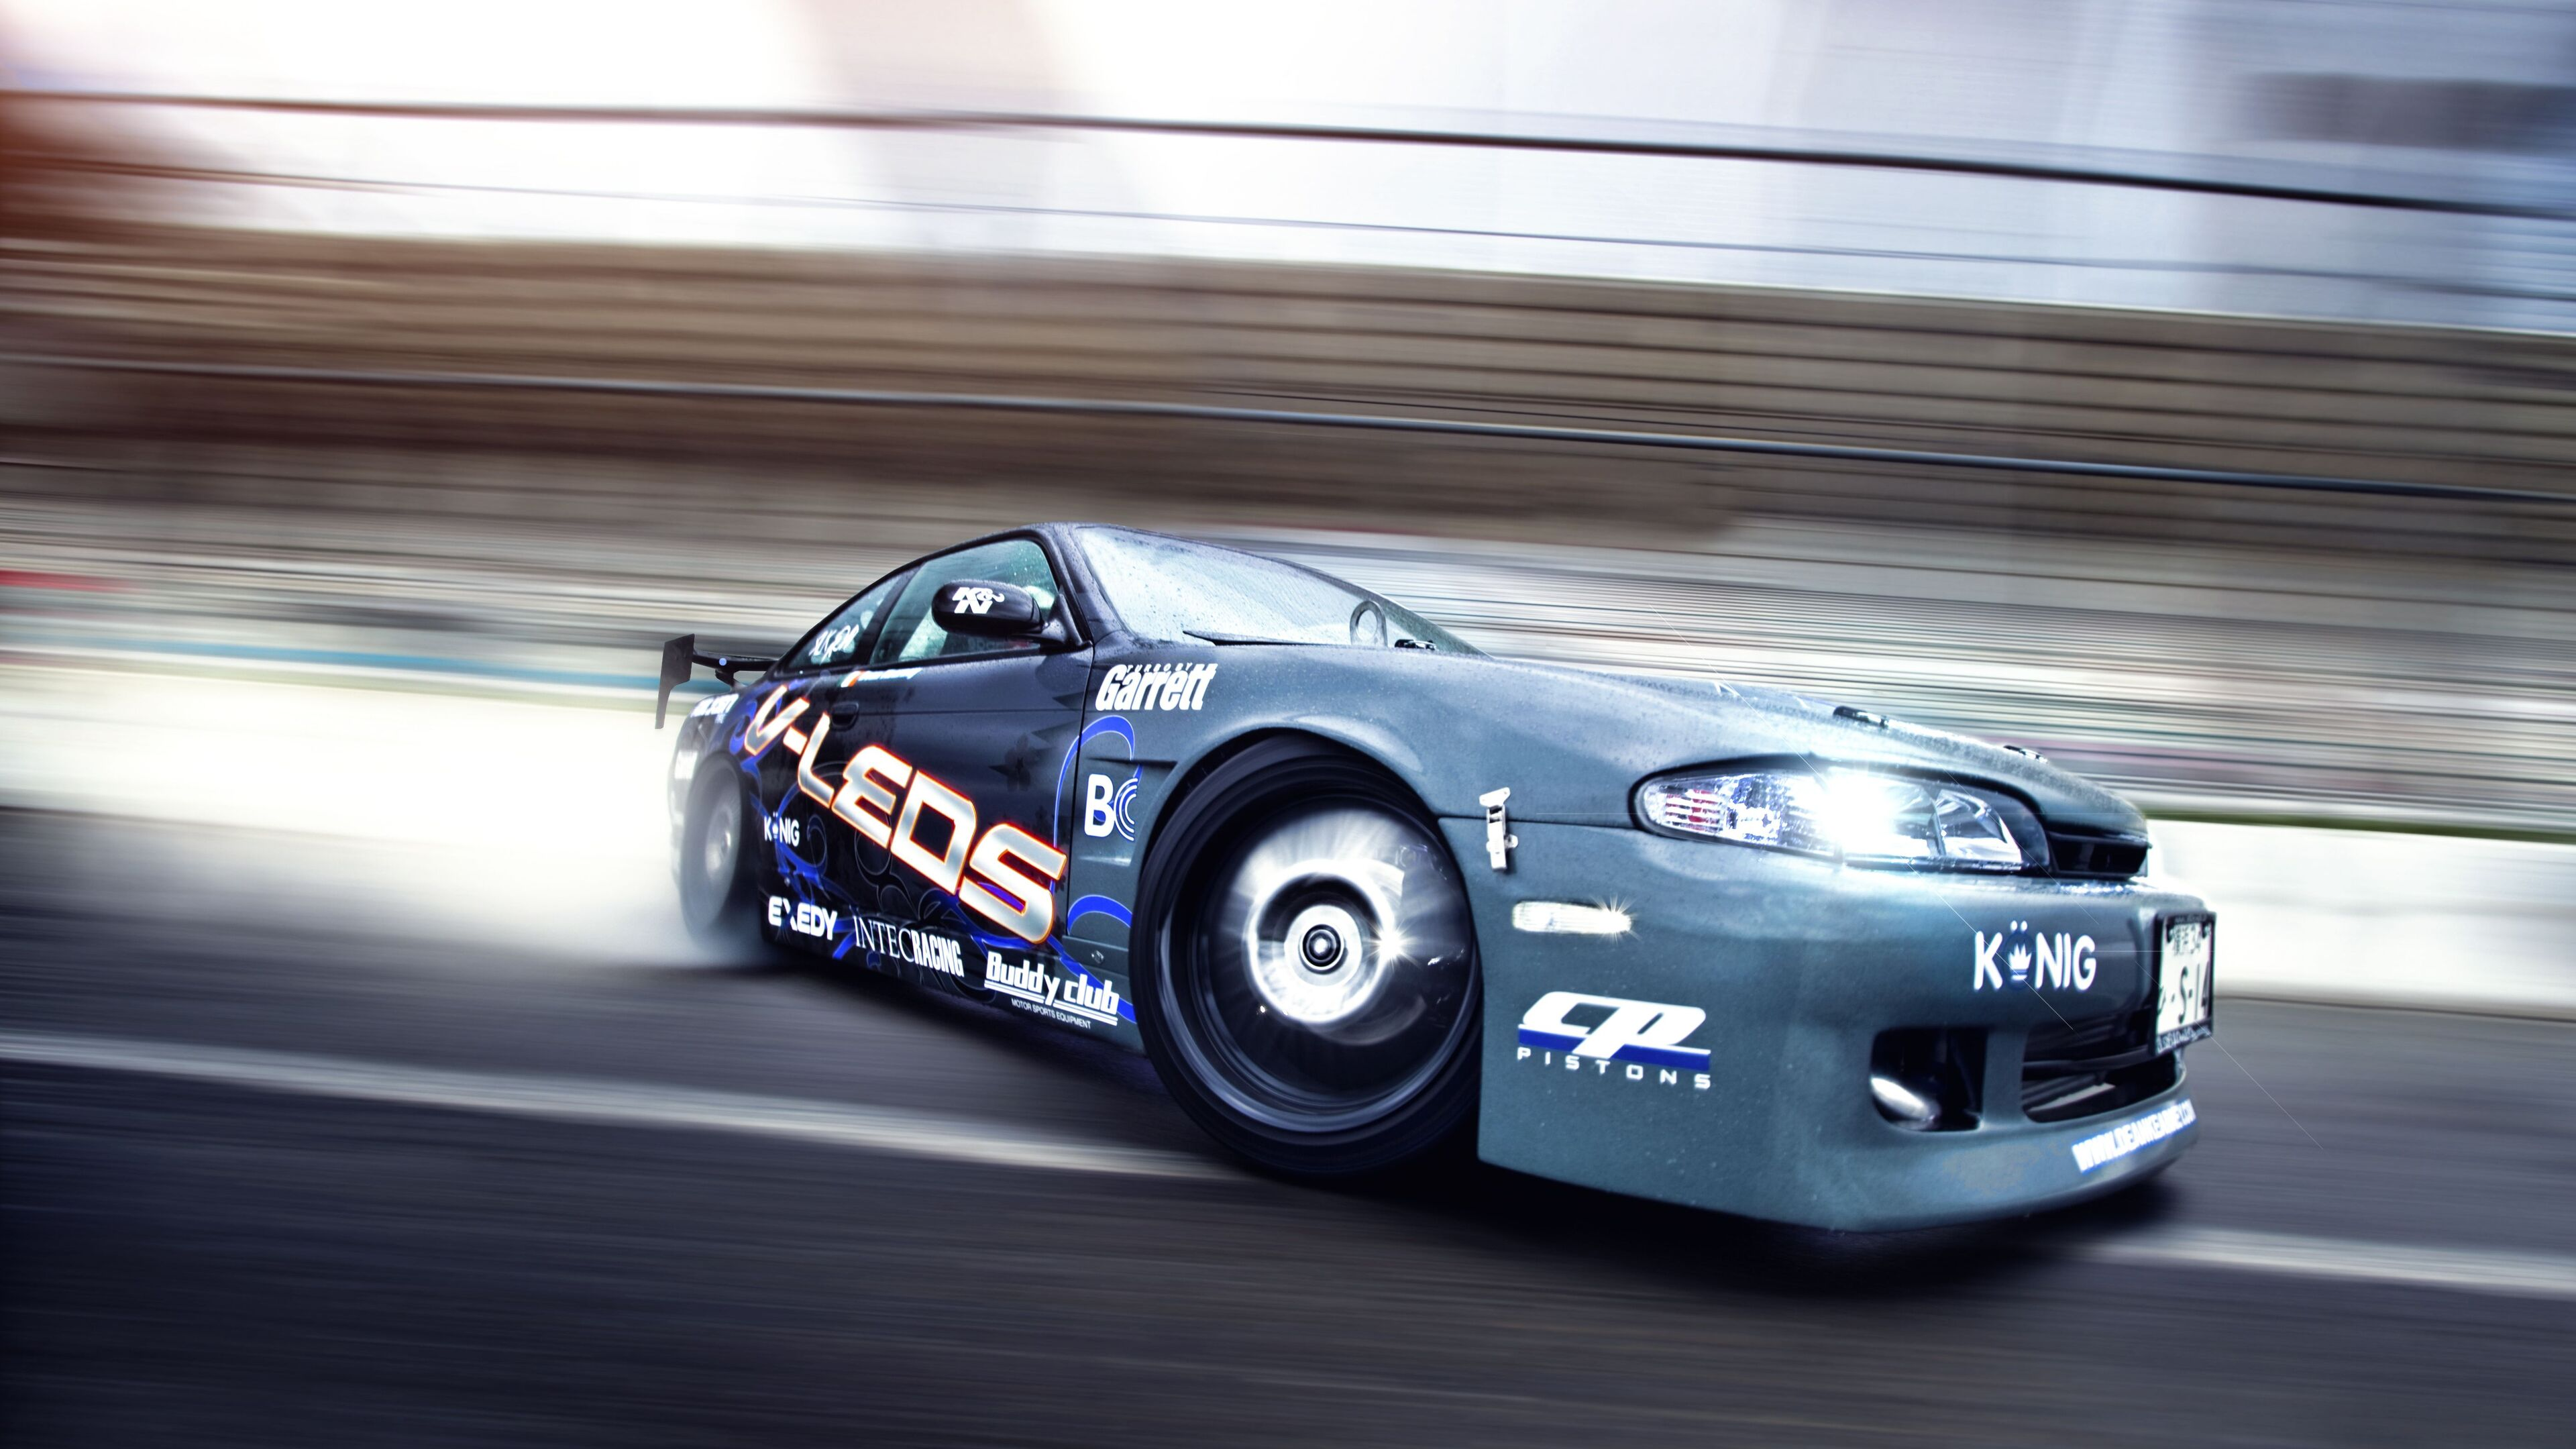 3840x2160 Drifting Car 4k HD 4k Wallpapers, Images ...